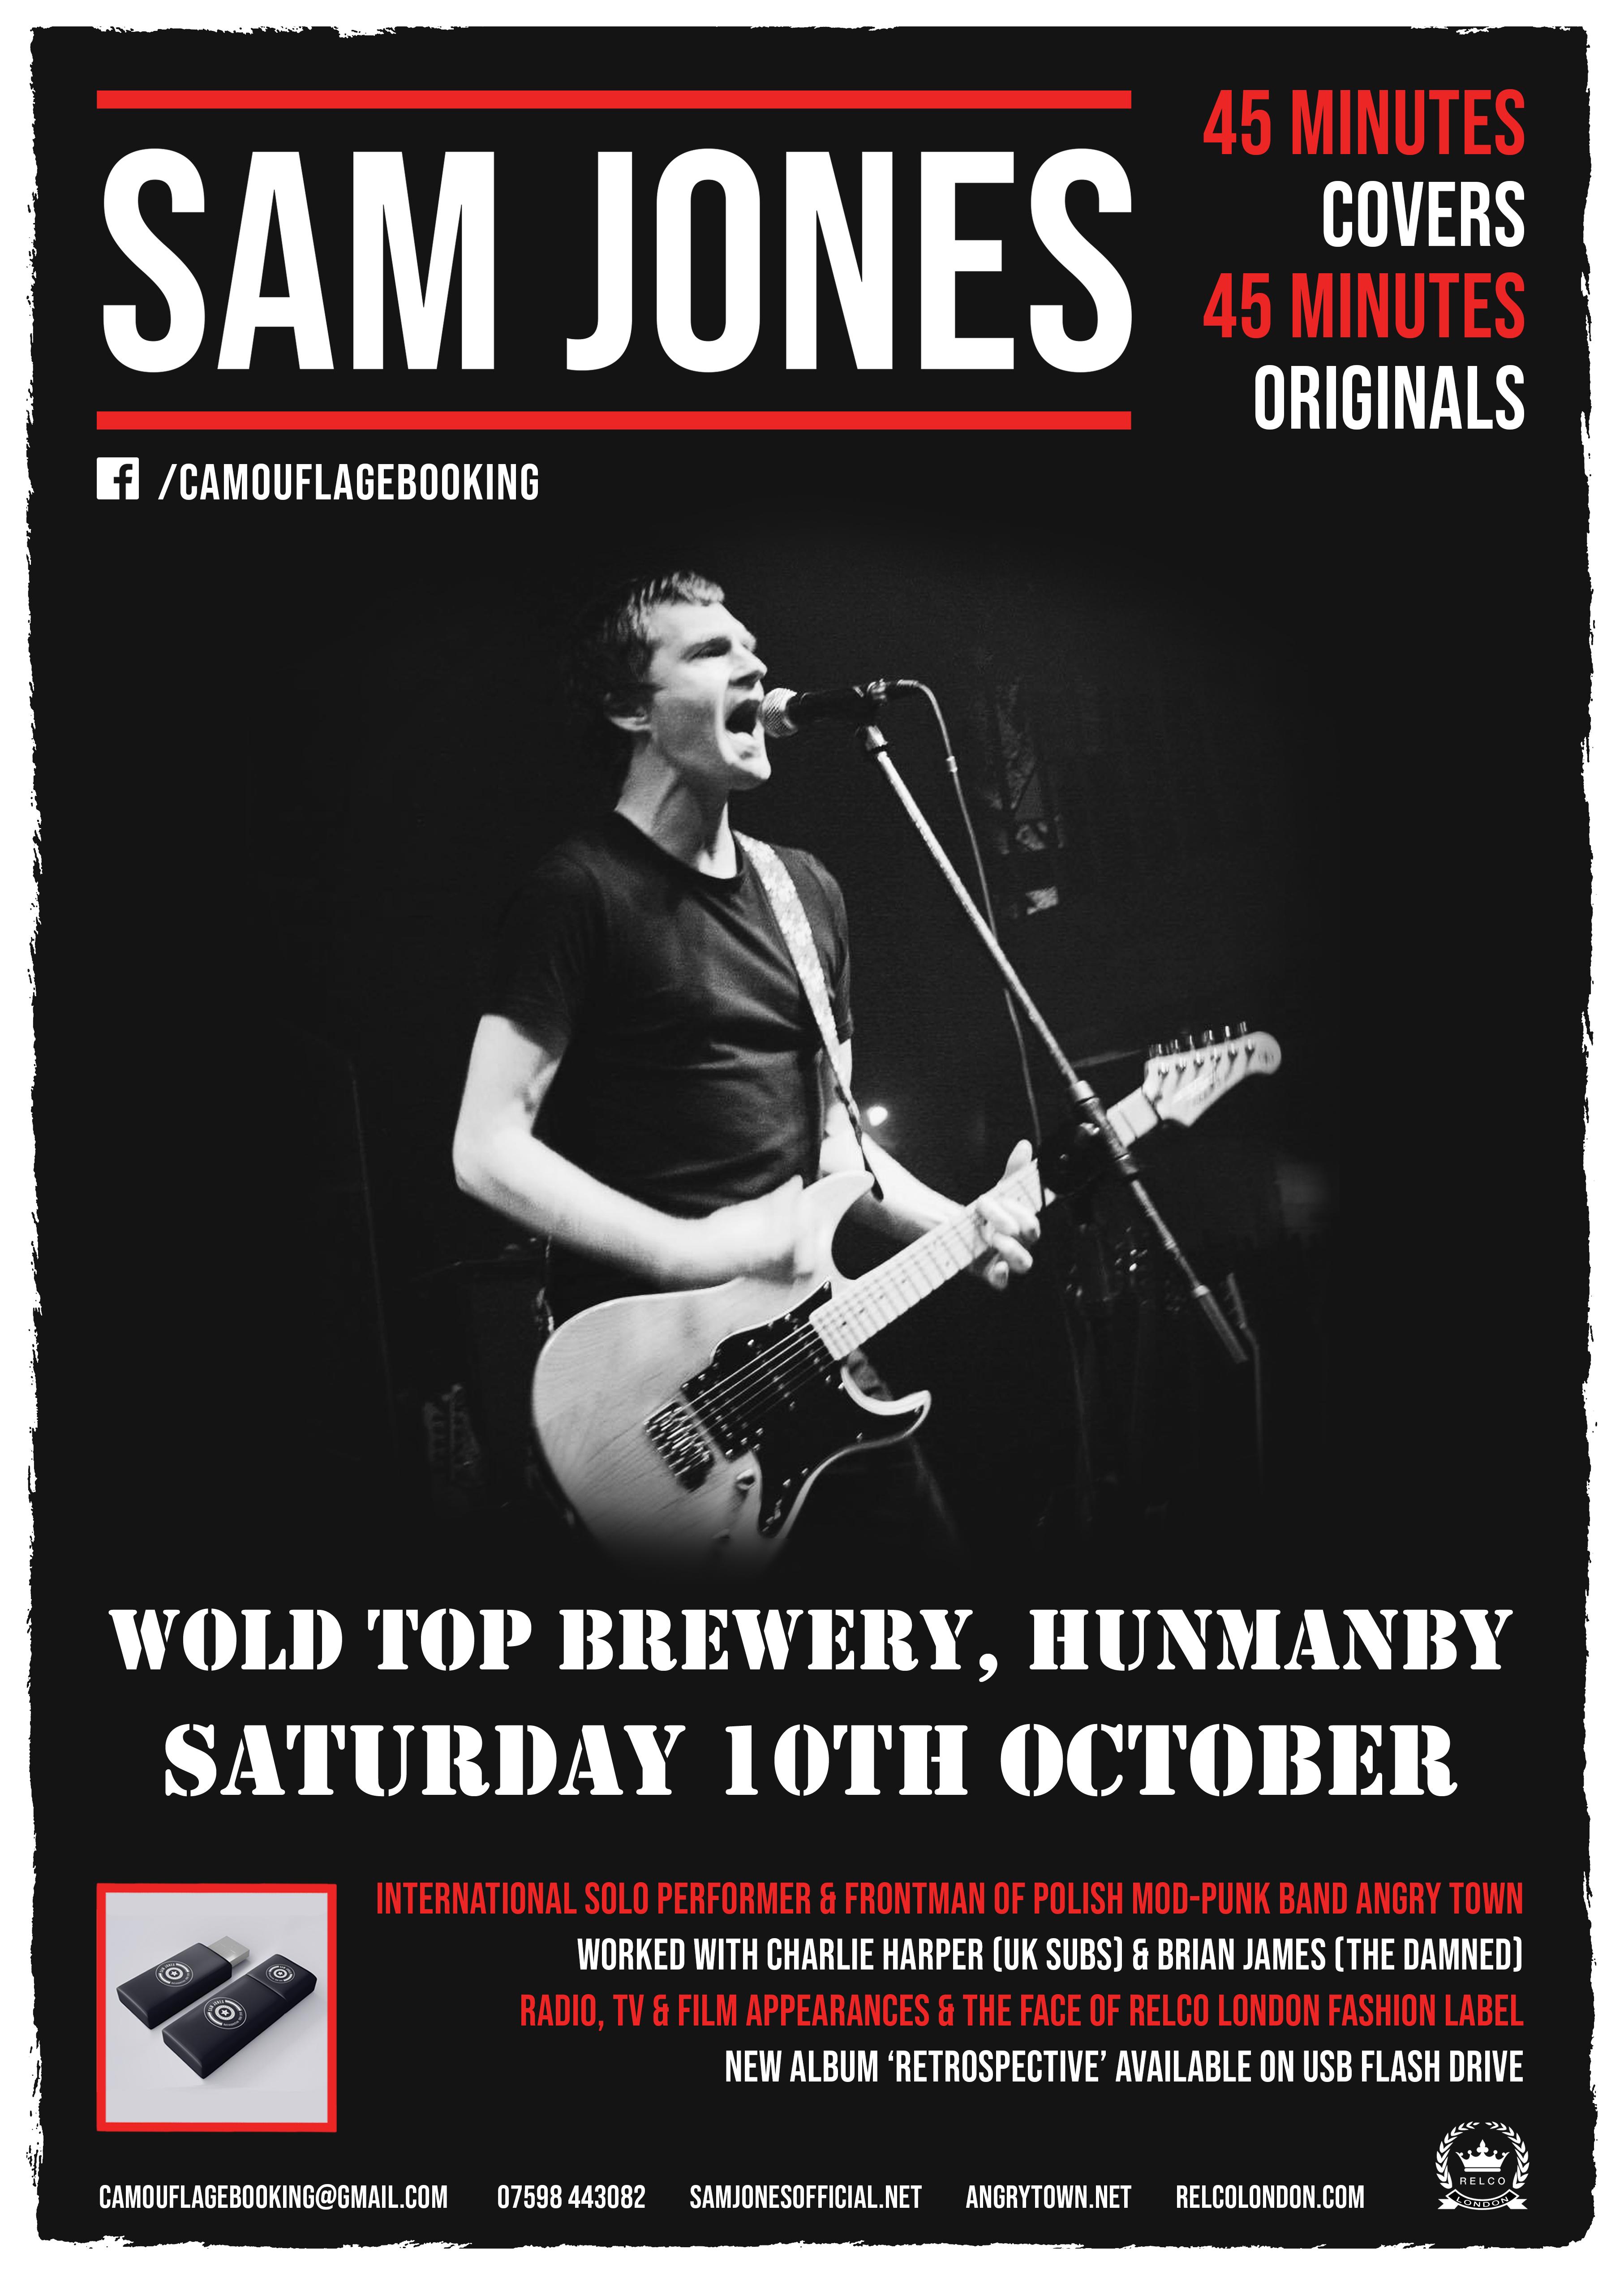 SAM JONES | OFFICIAL WEBSITE focused on the solo ...